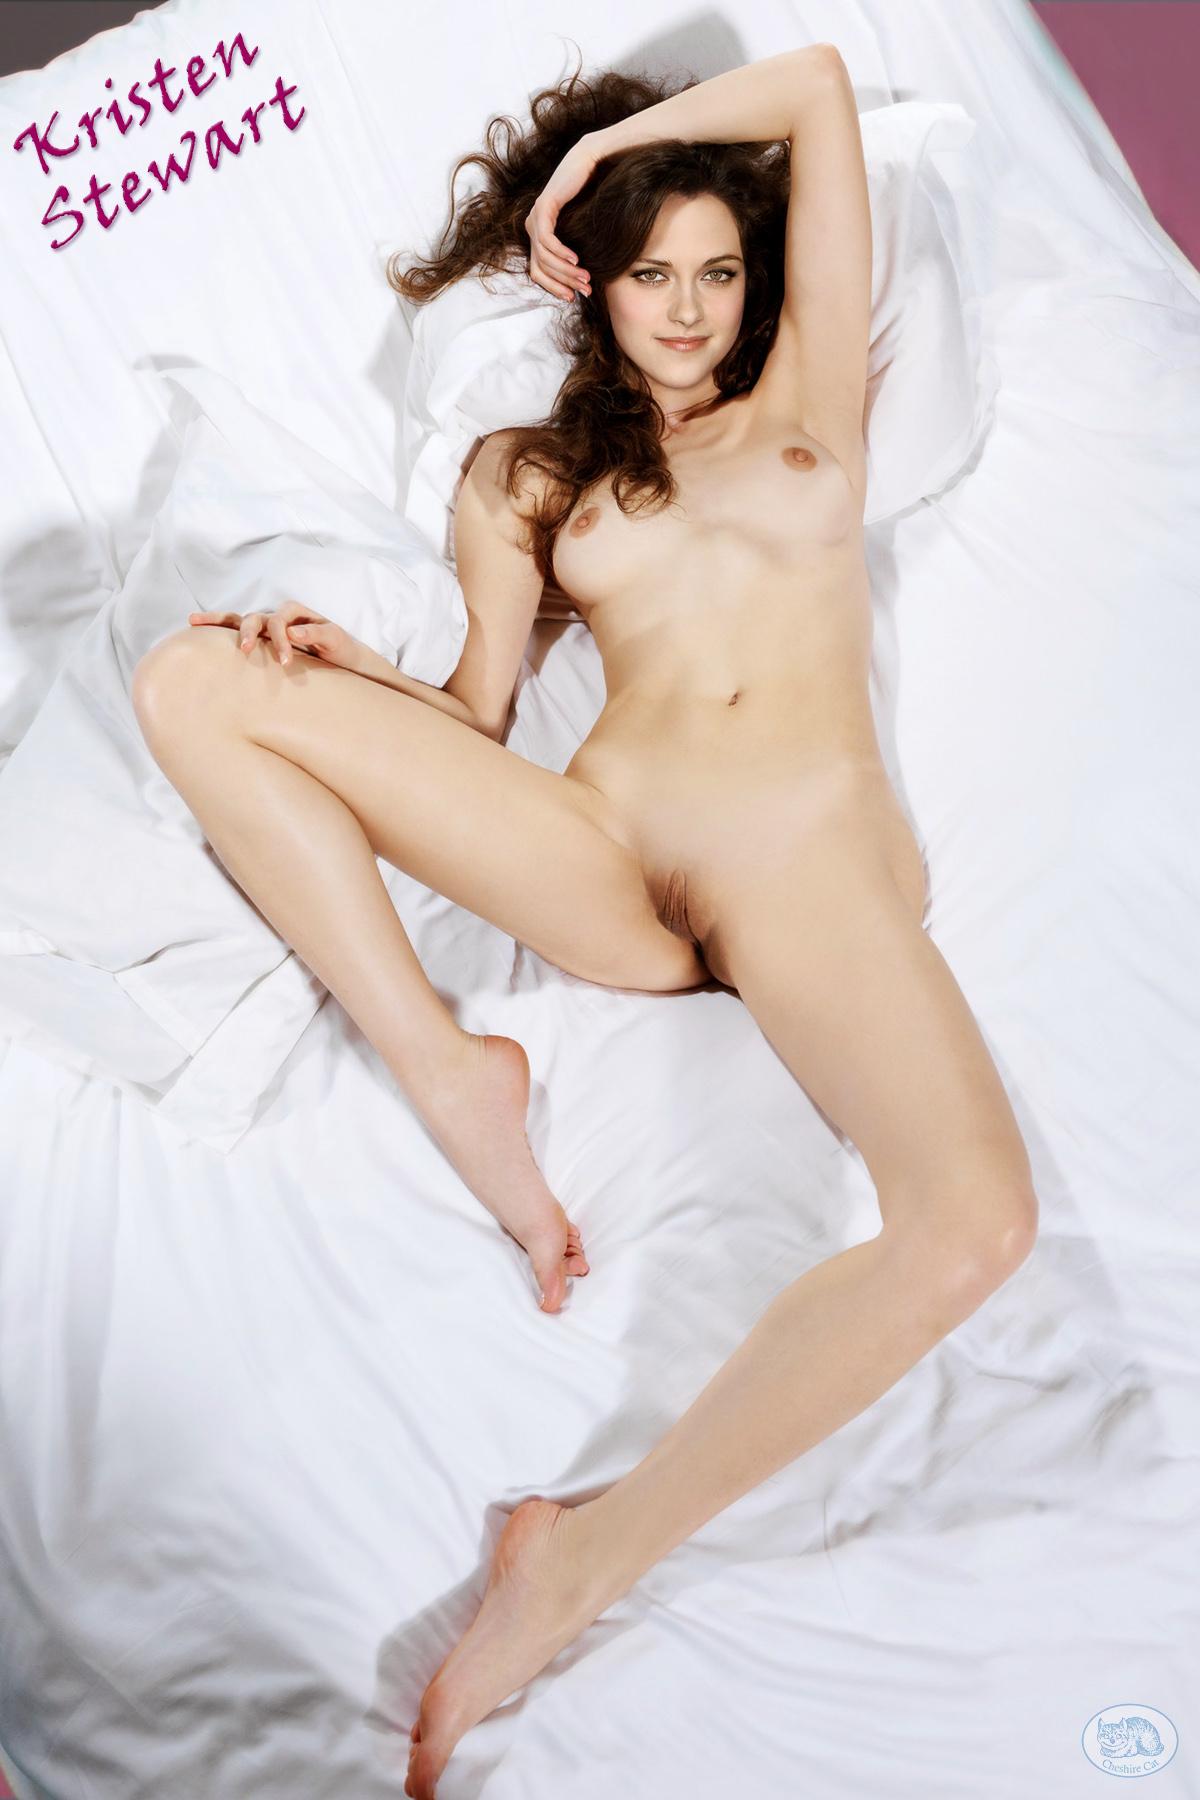 granddaughter small virgin cunt cock